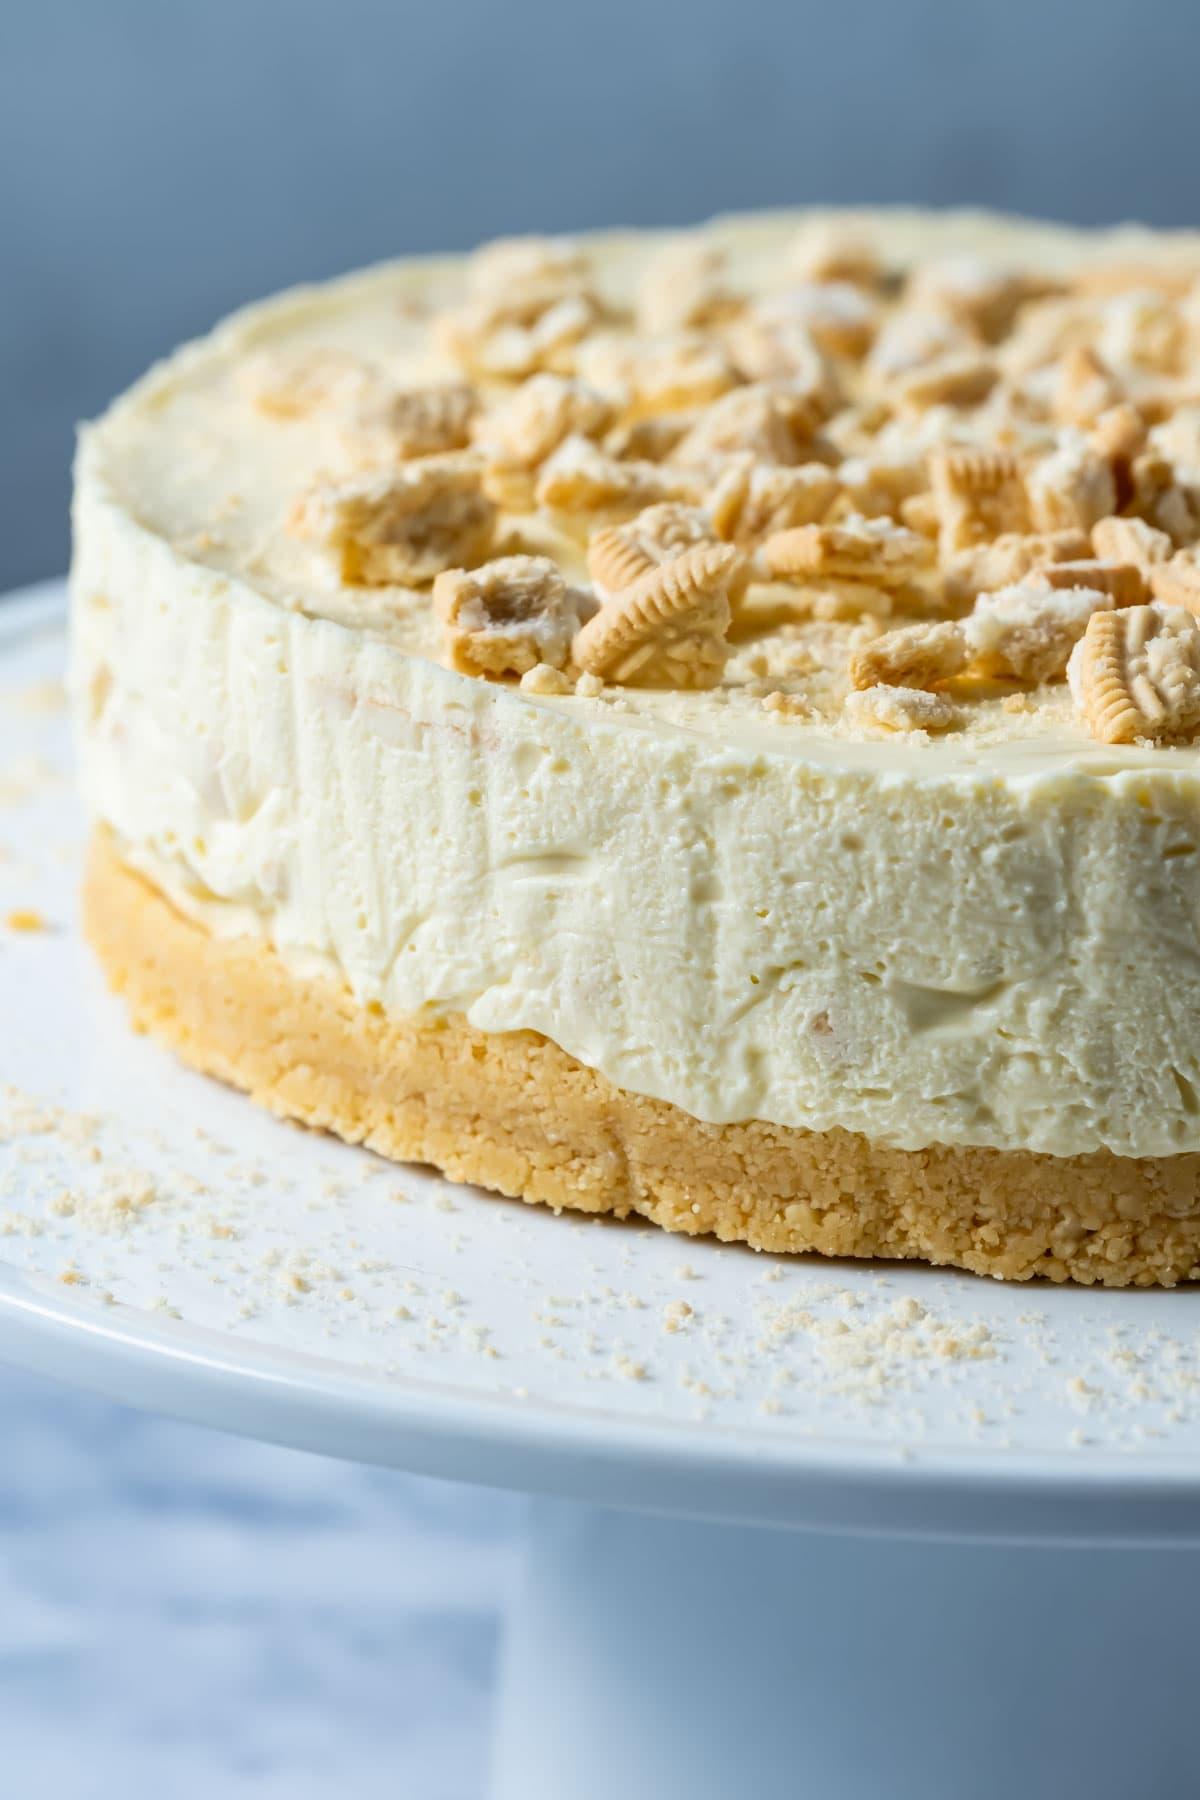 Golden oreo cheesecake on a white cake stand.